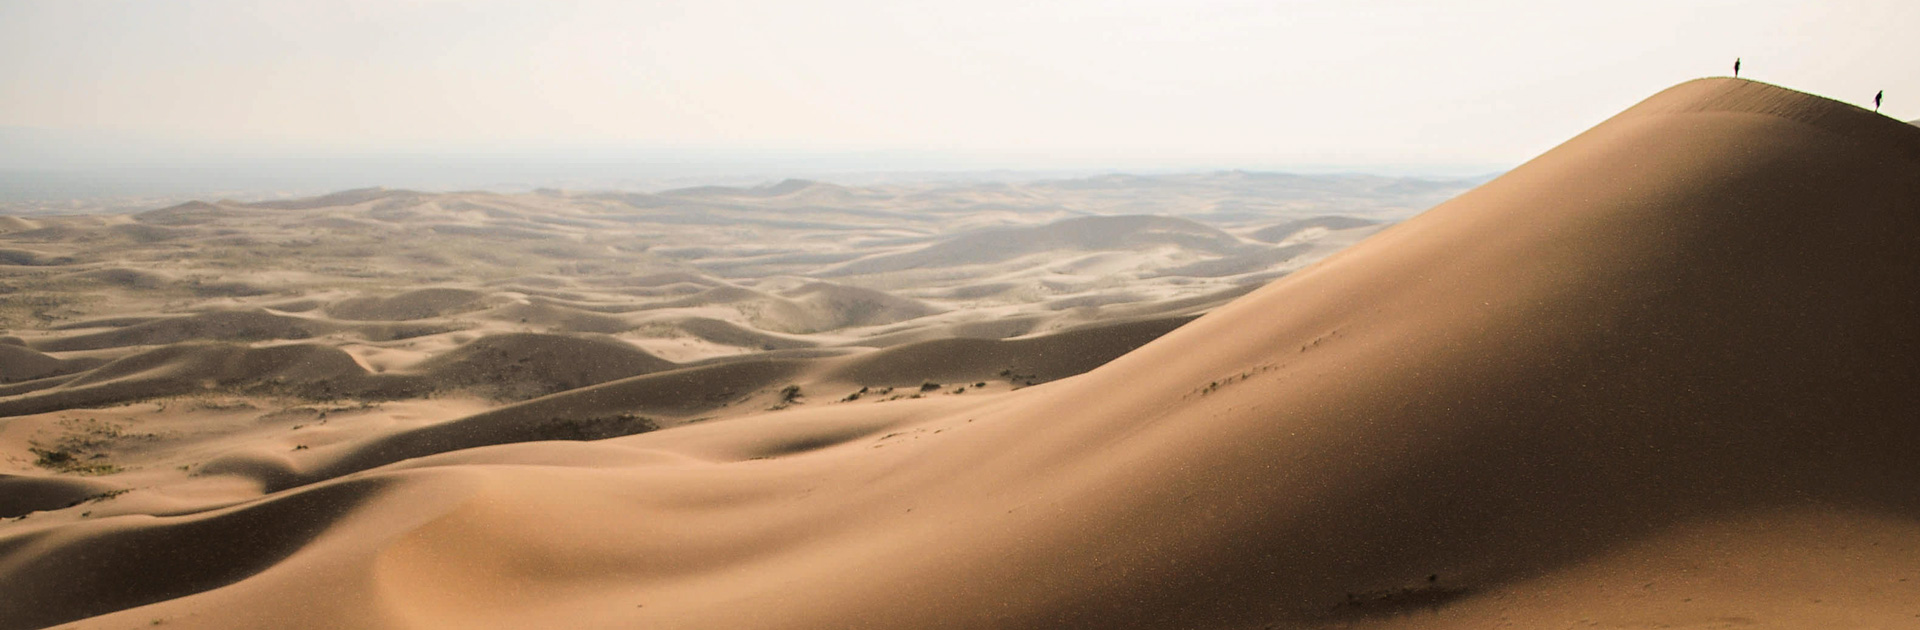 MN Mongolia Explorar la Tierra Misteriosa 14 días 1